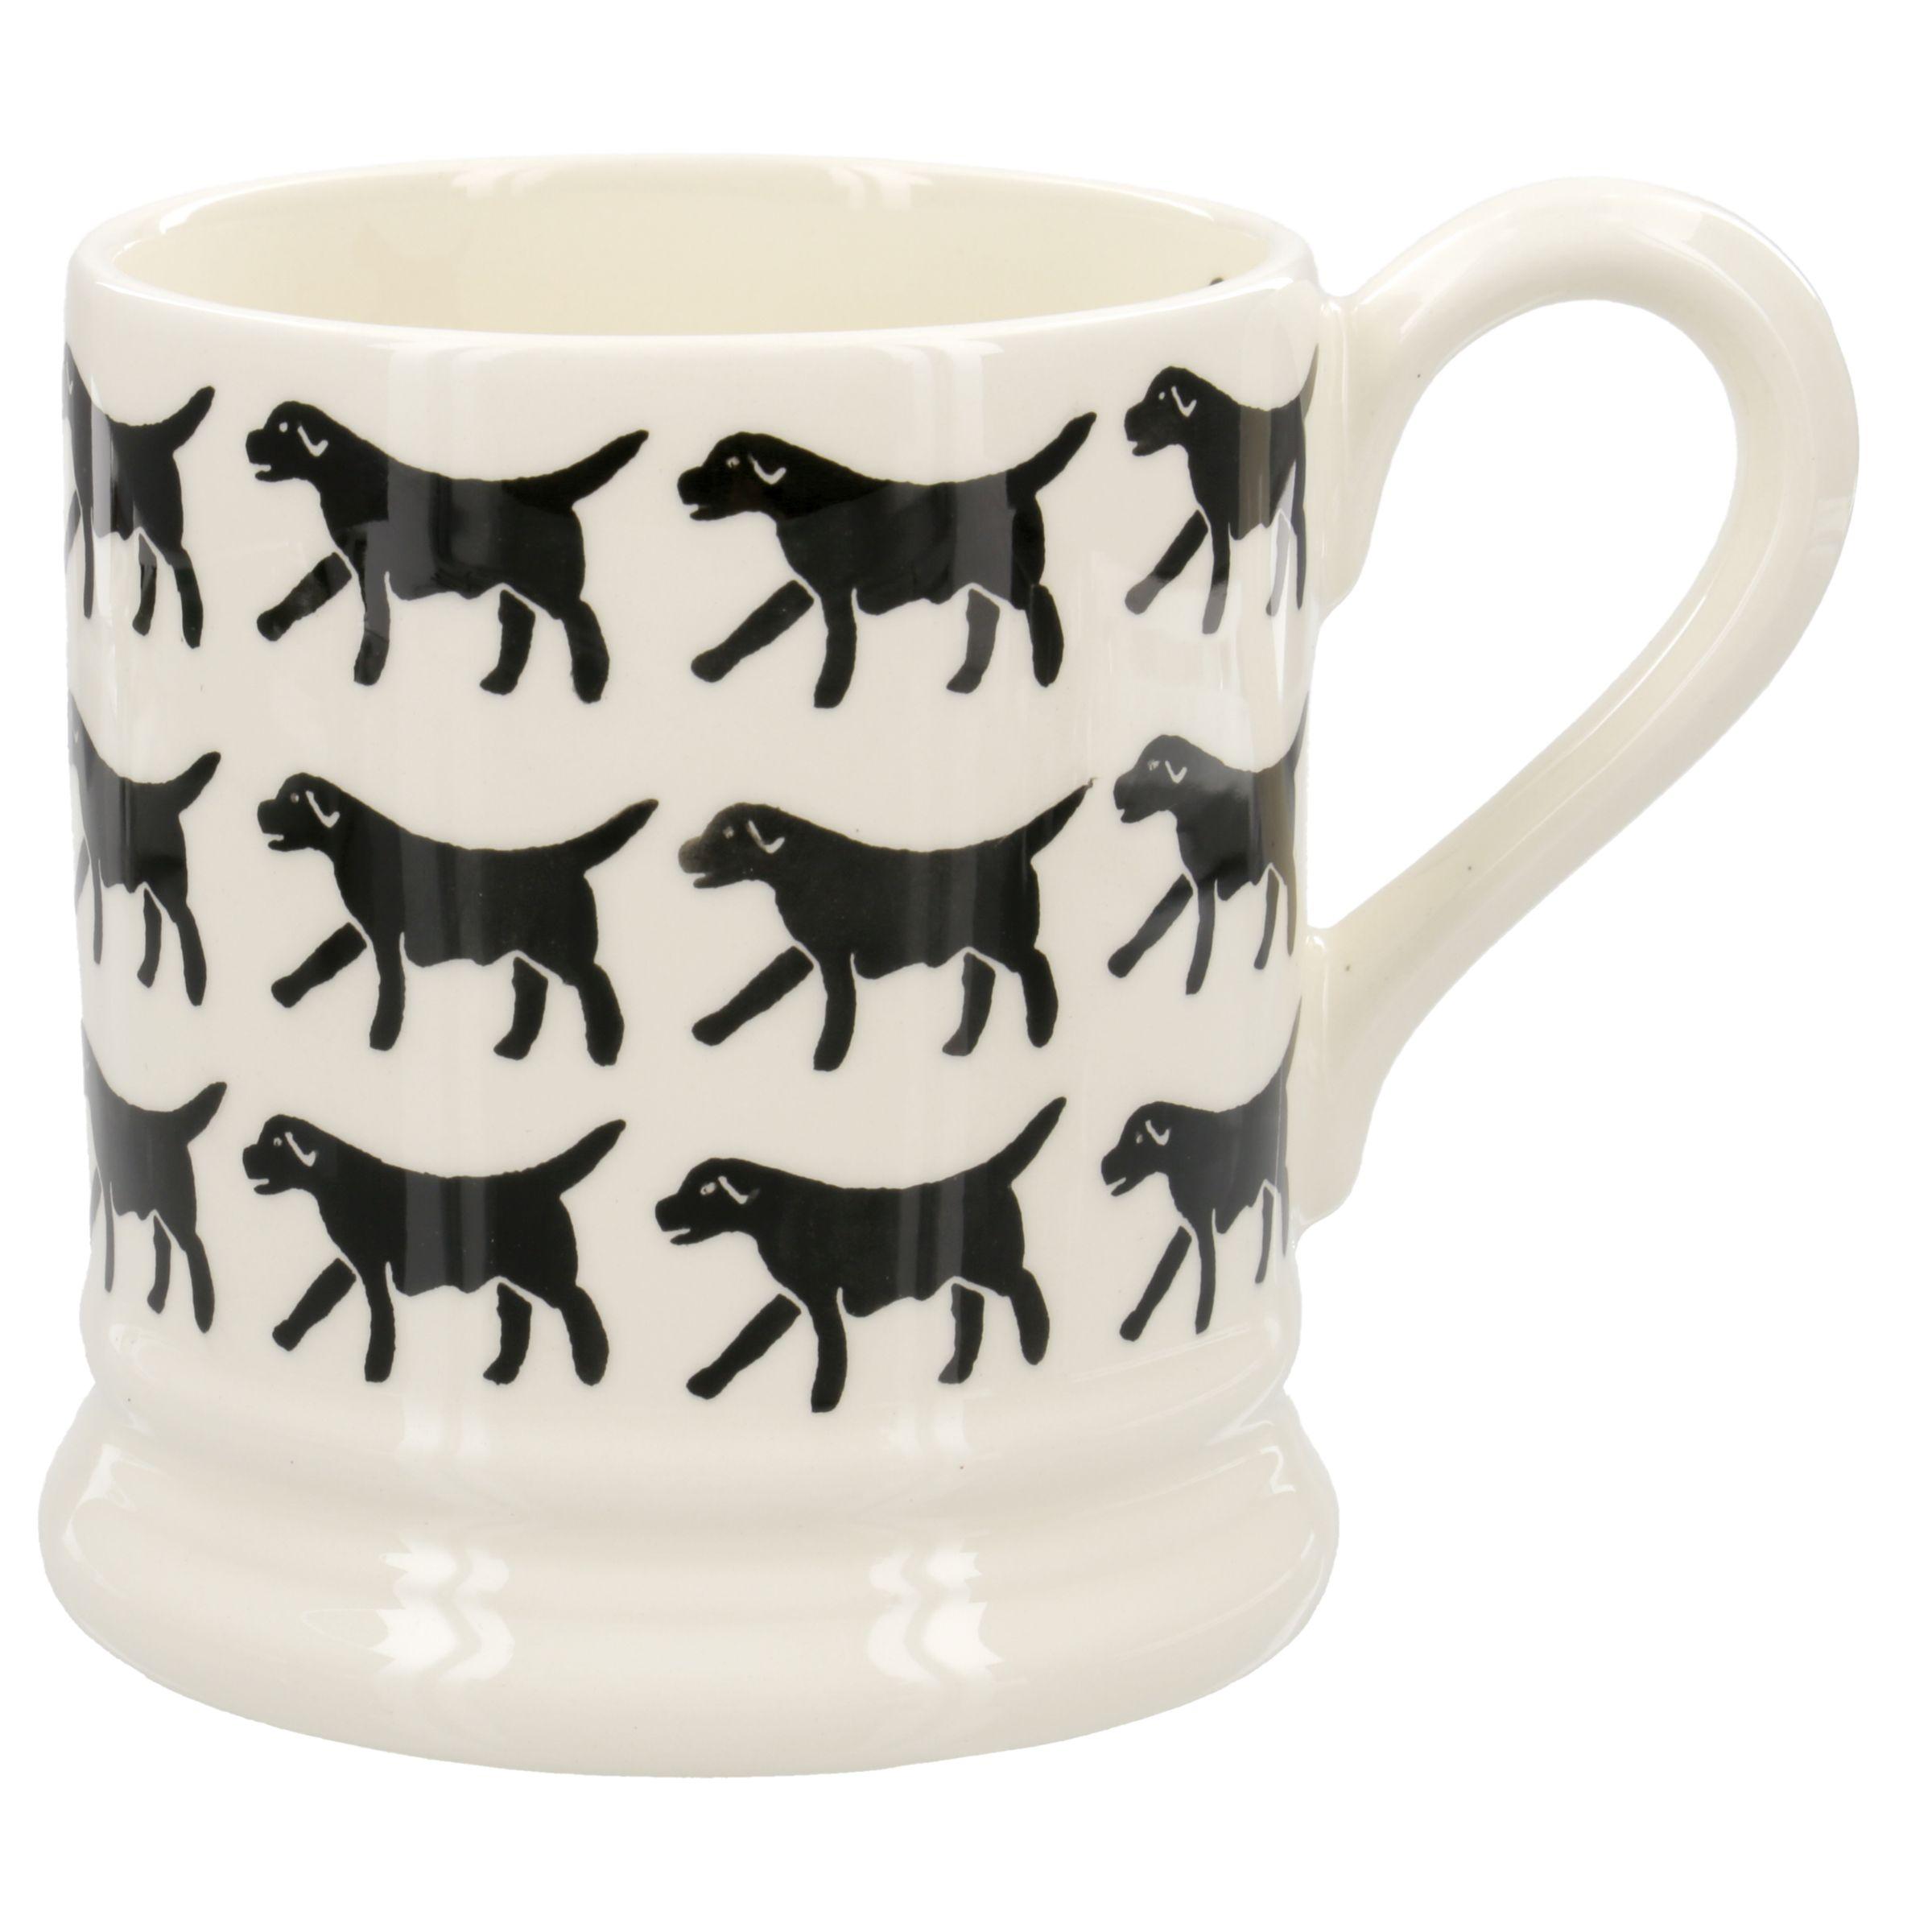 Emma Bridgewater Emma Bridgewater Black Labrador 1/2pt Mug